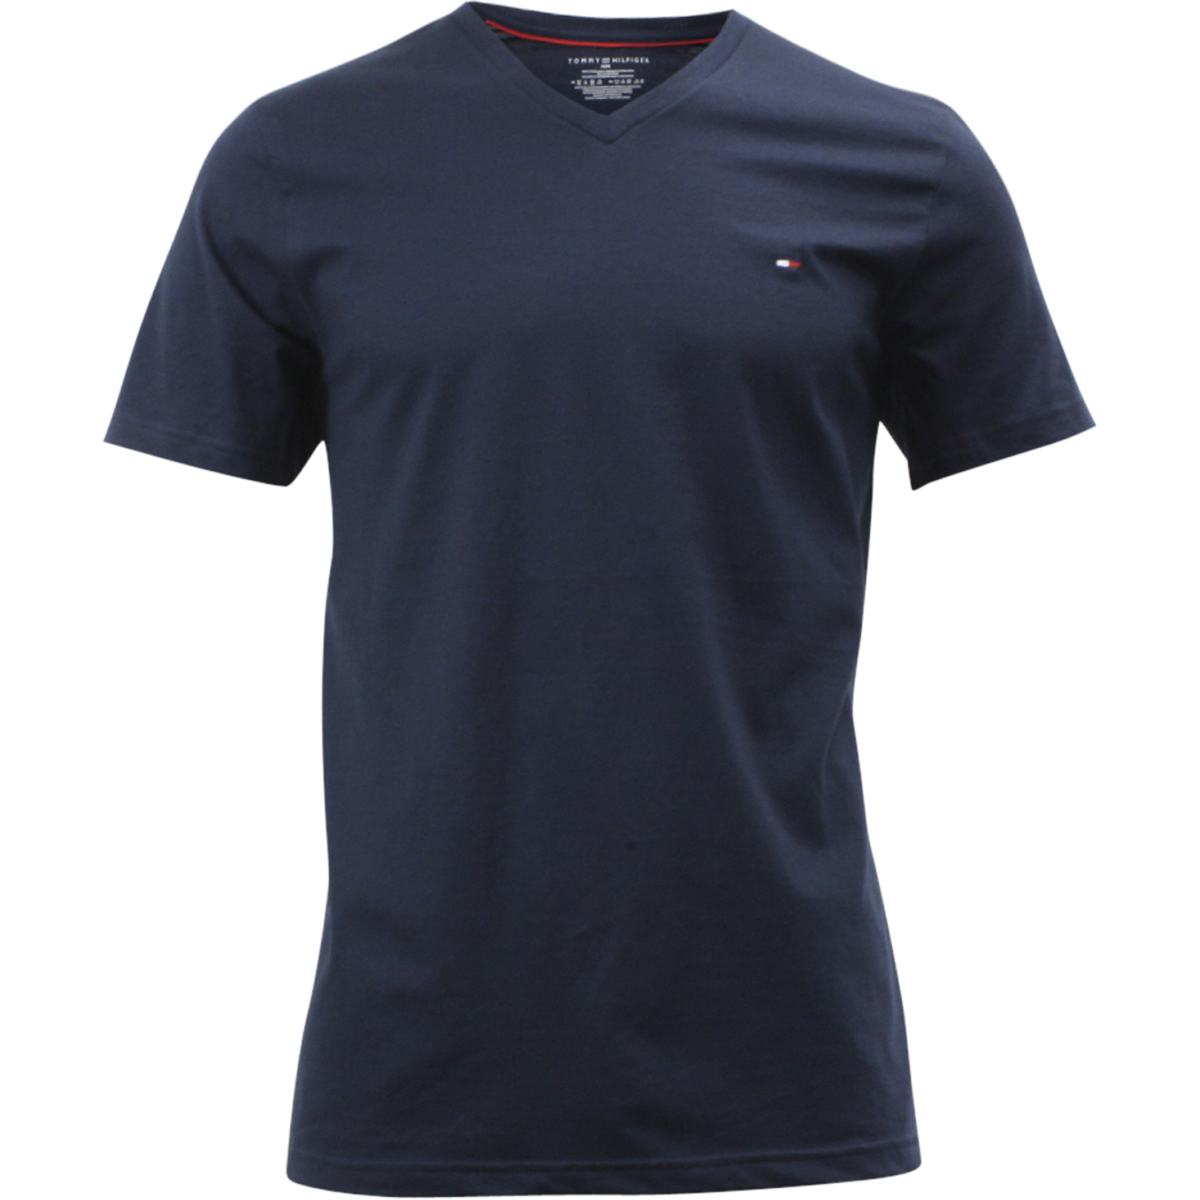 Tommy Hilfiger Men/'s Core Flag Short Sleeve Crew Neck Dark Navy Cotton T-Shirt